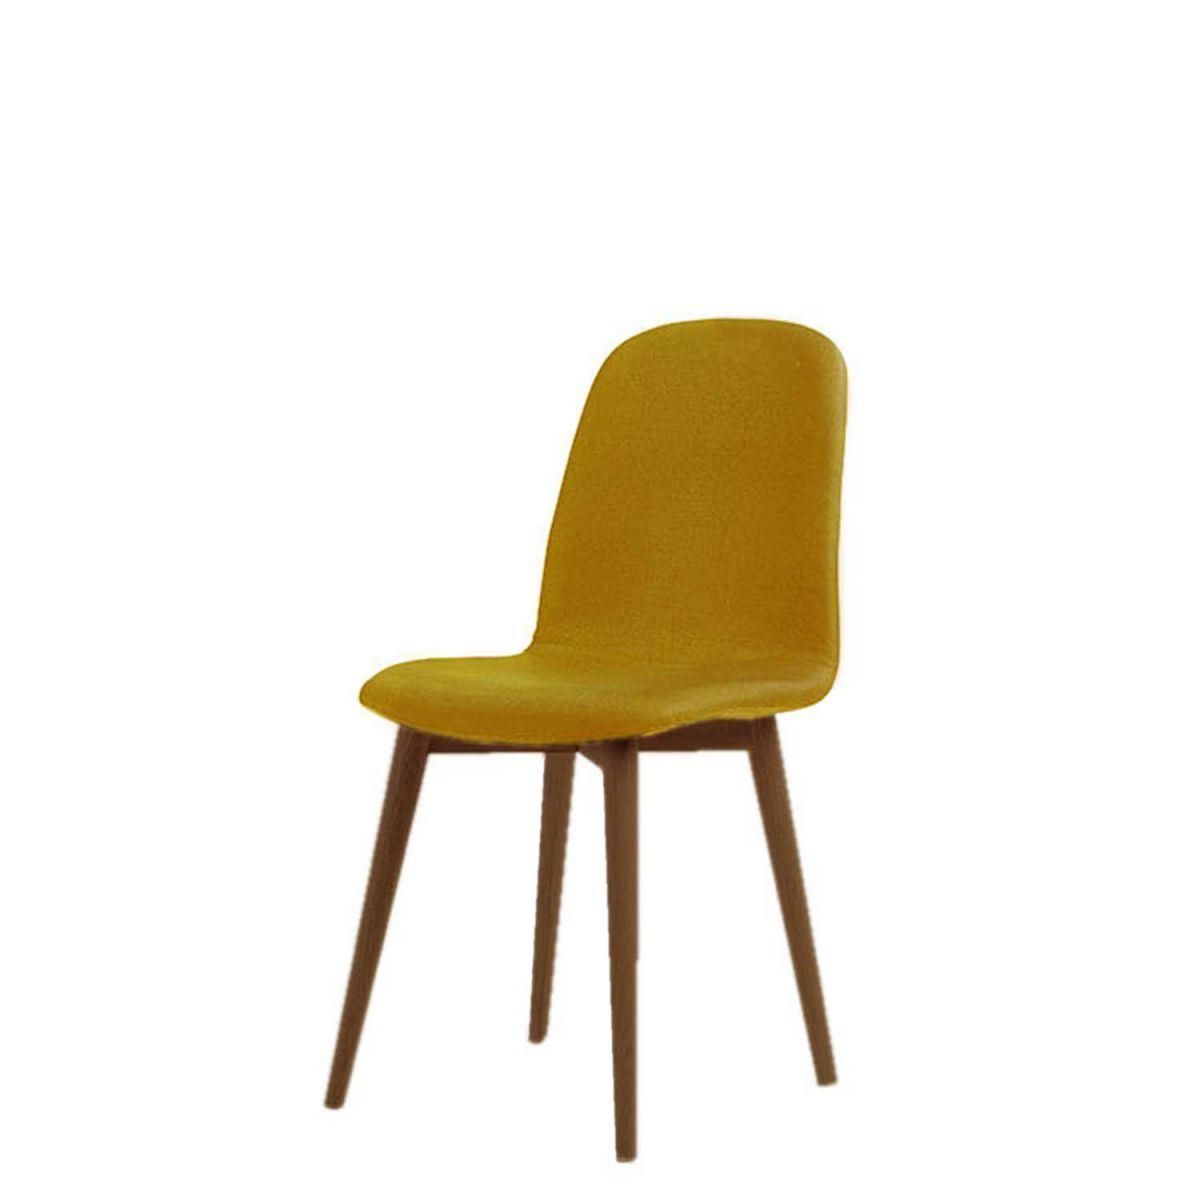 BASIC Dining Chair